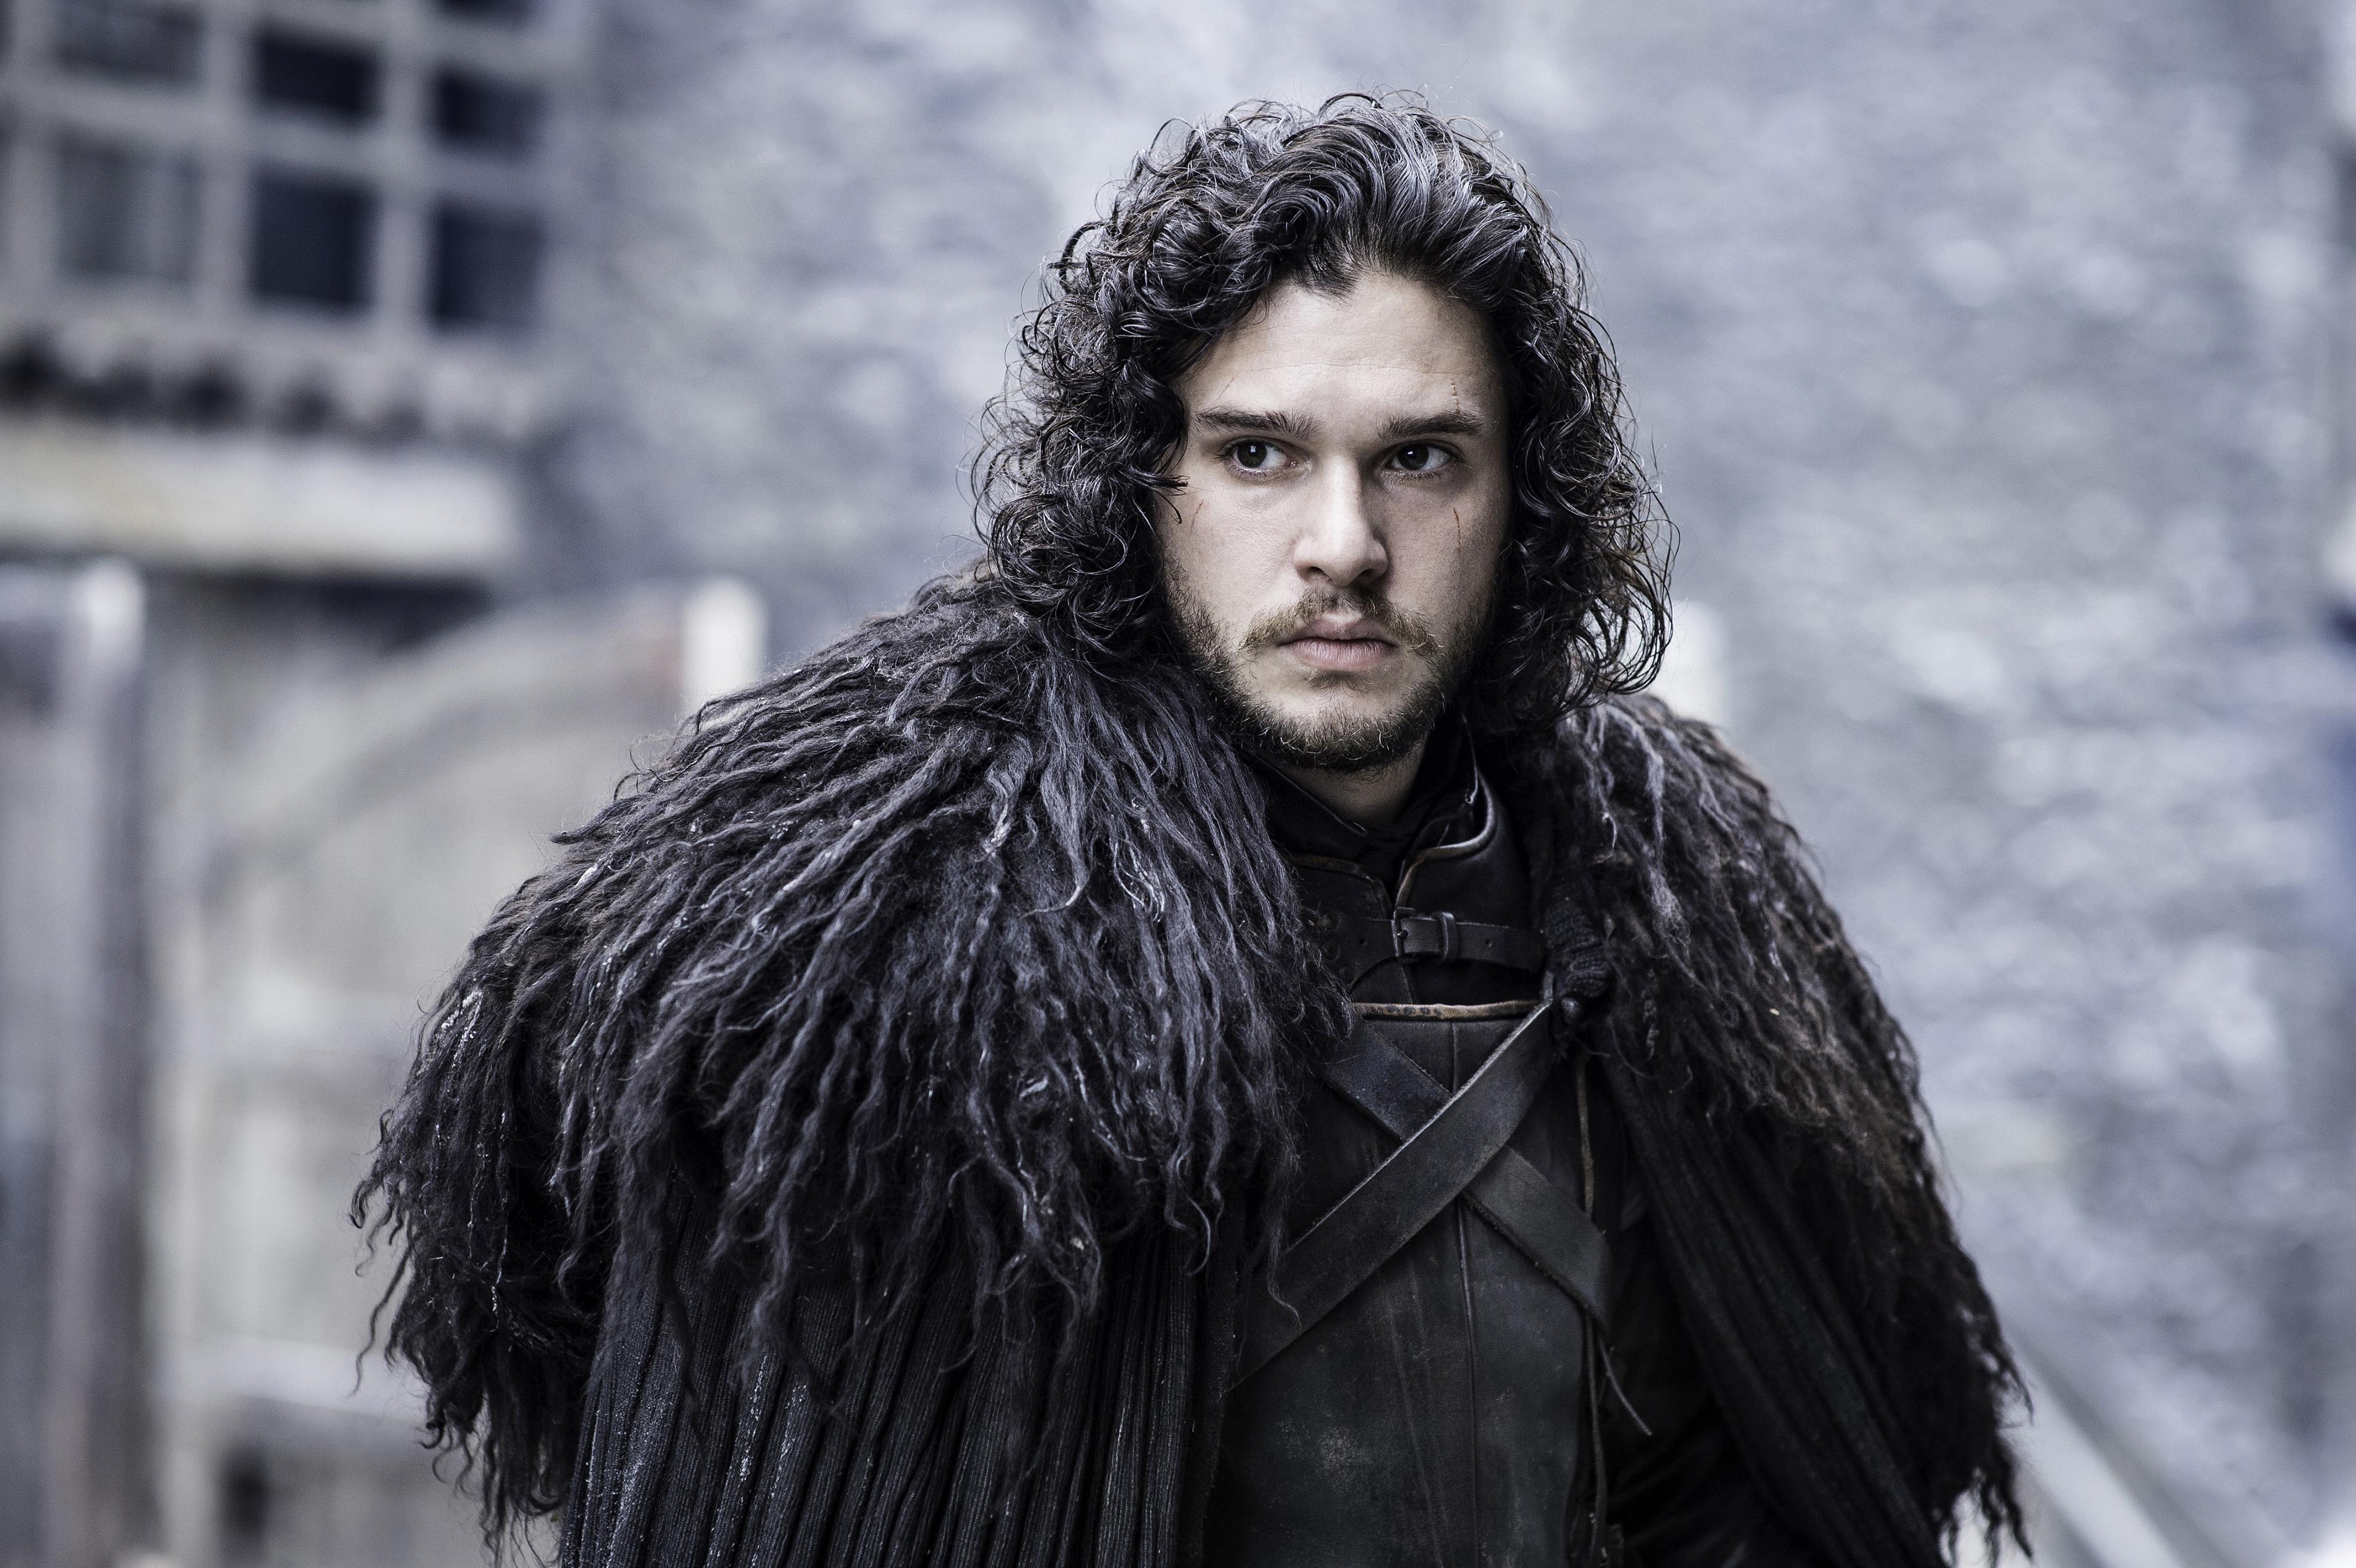 posible-se-haya-revelado-verdadero-nombre-jon-snow-game-of-thrones-frikigamers.com